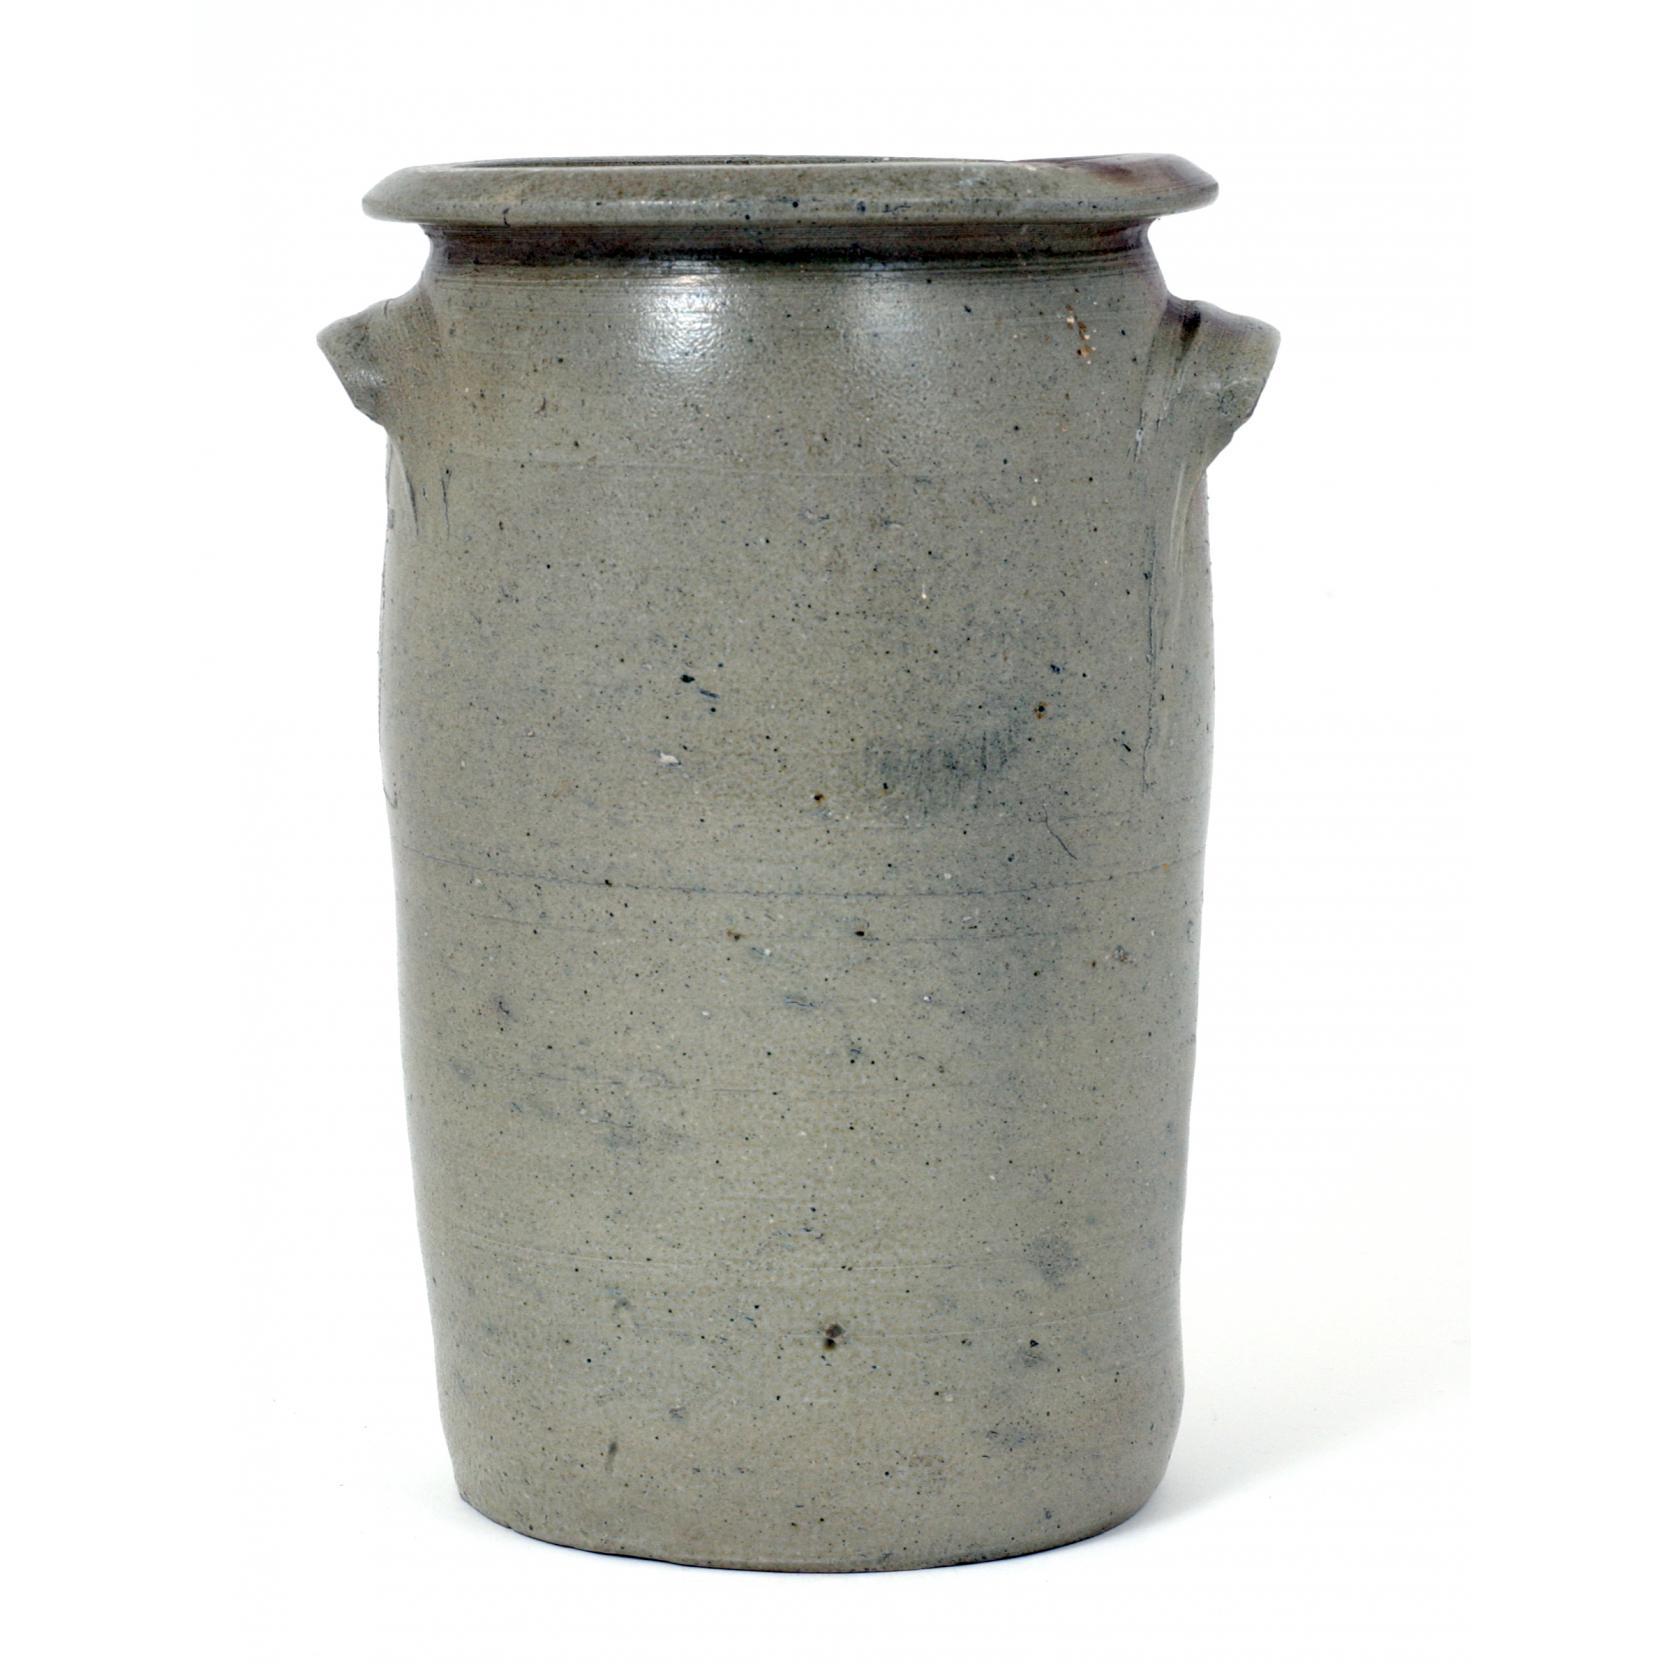 nc-pottery-storage-jar-j-d-craven-randolph-county-1827-1895